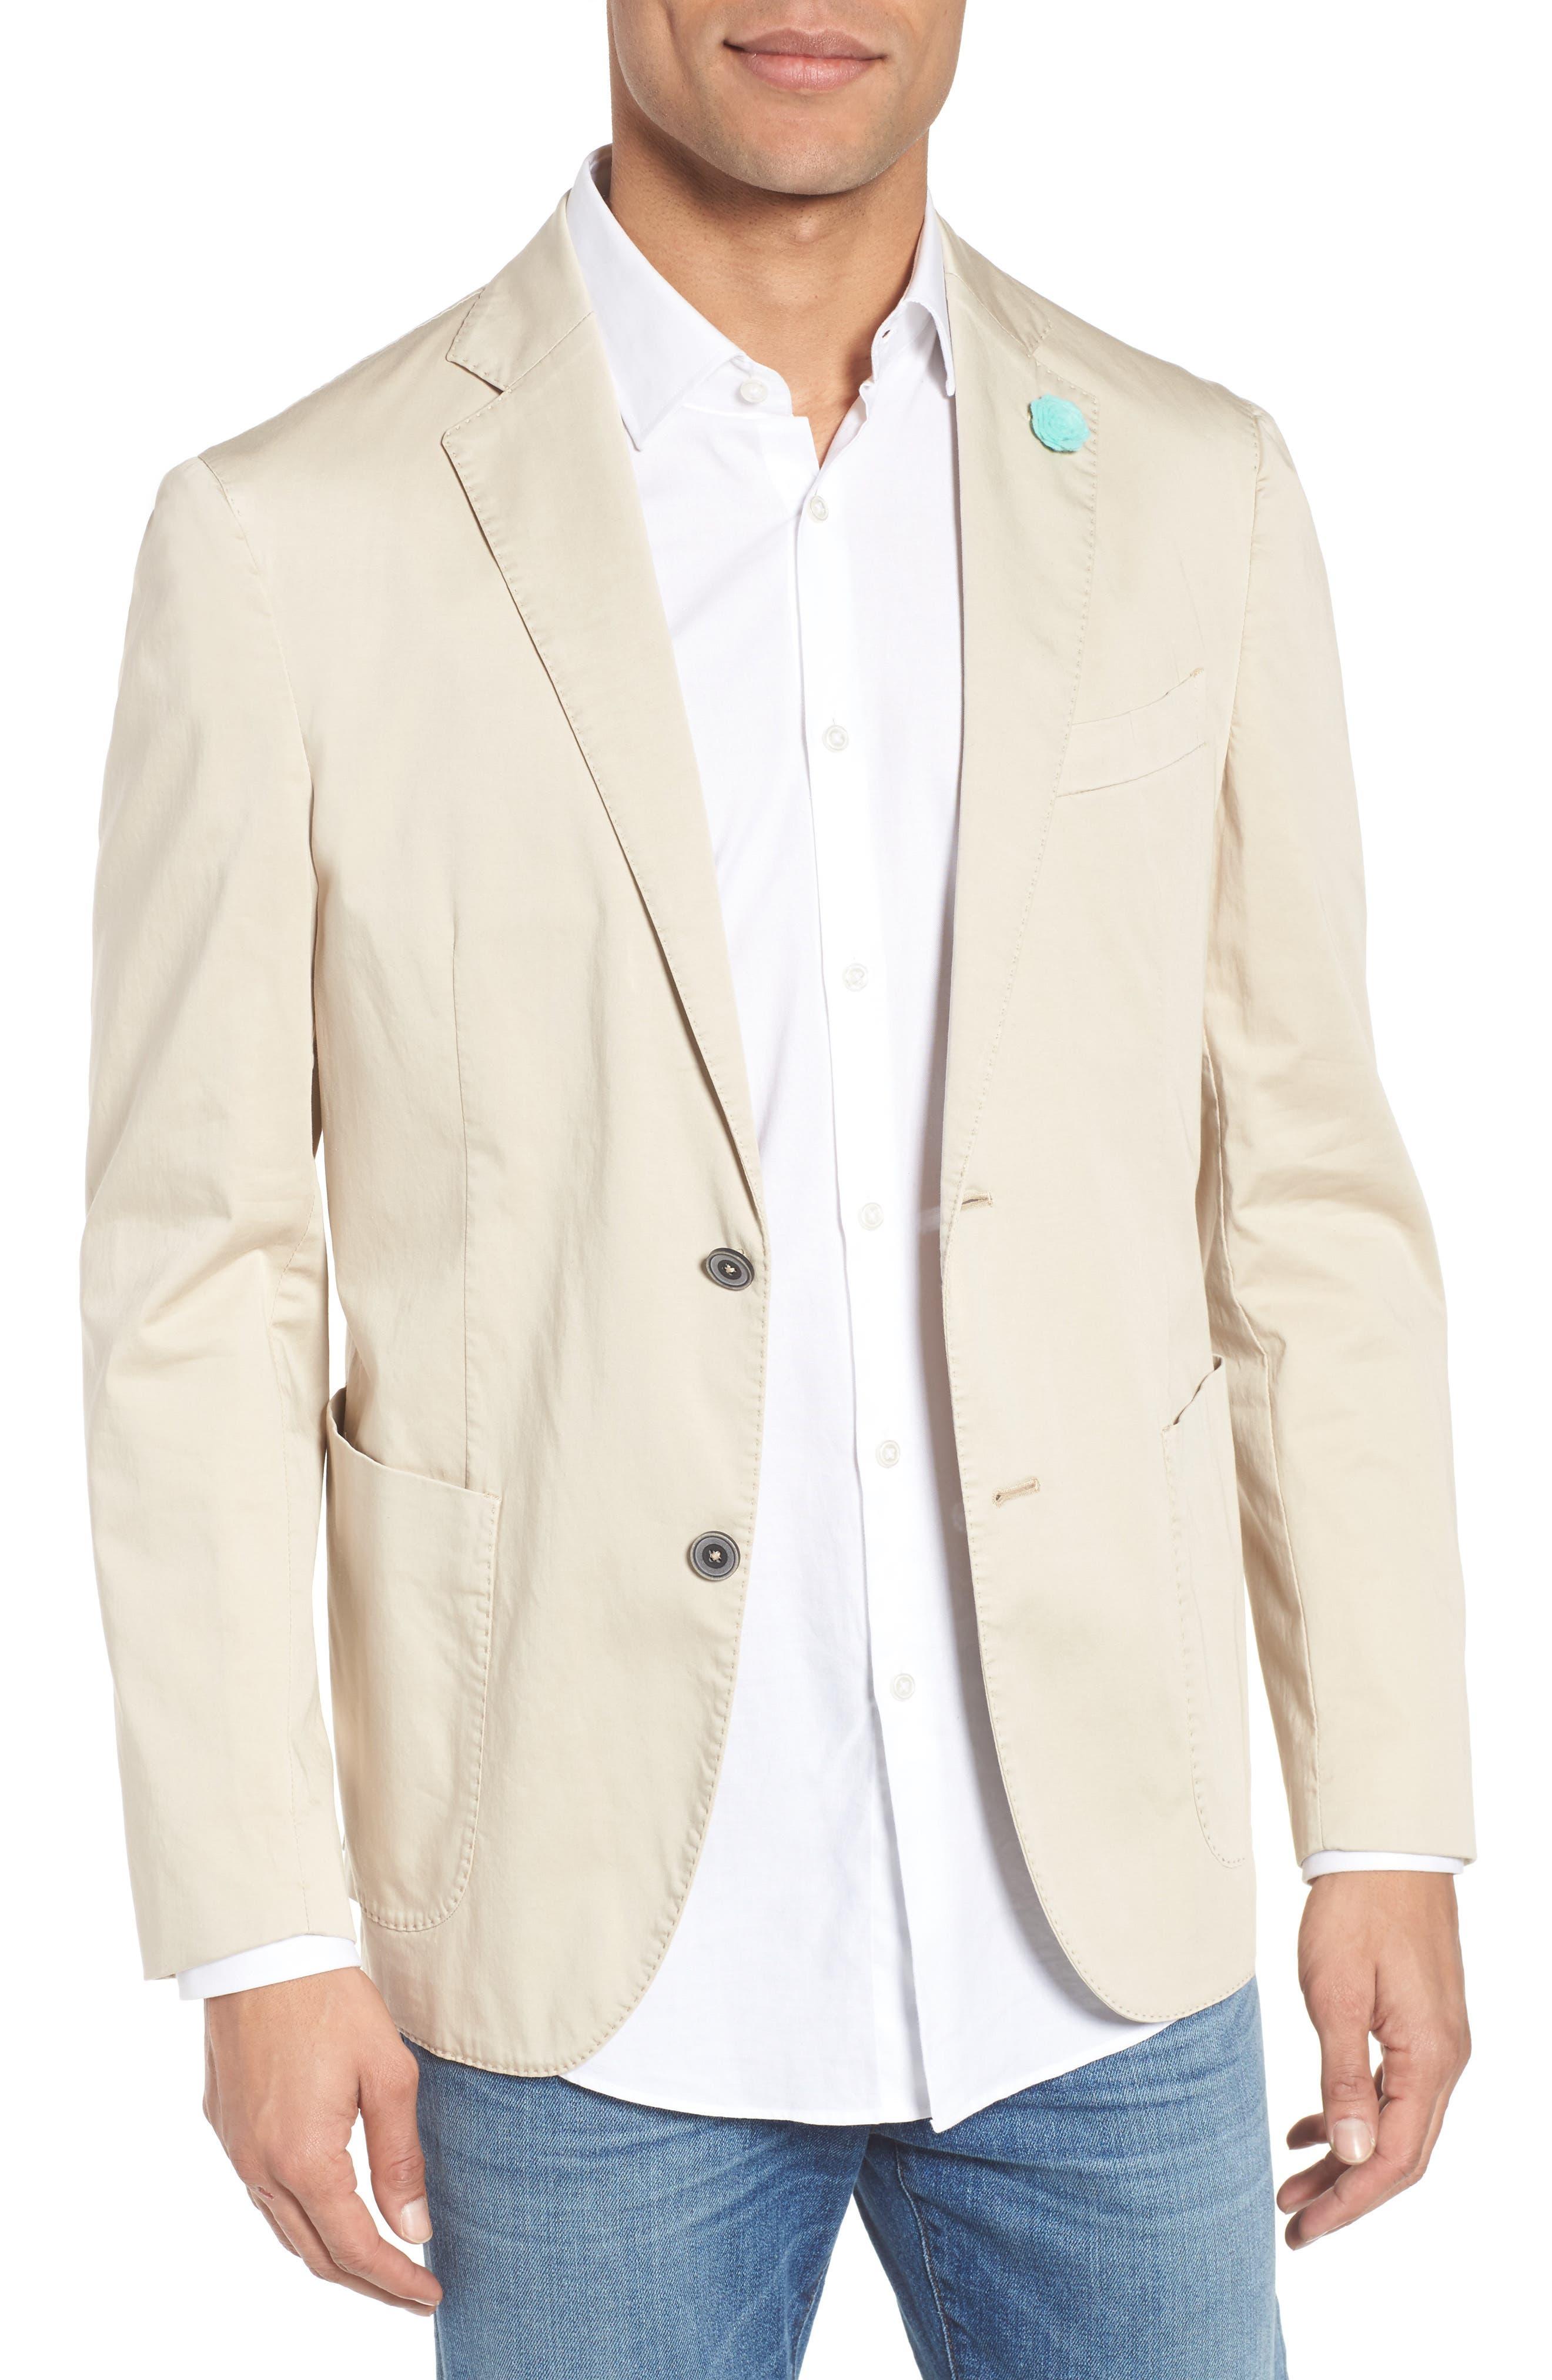 Alternate Image 1 Selected - Culturata Trim Fit Stretch Cotton Blazer